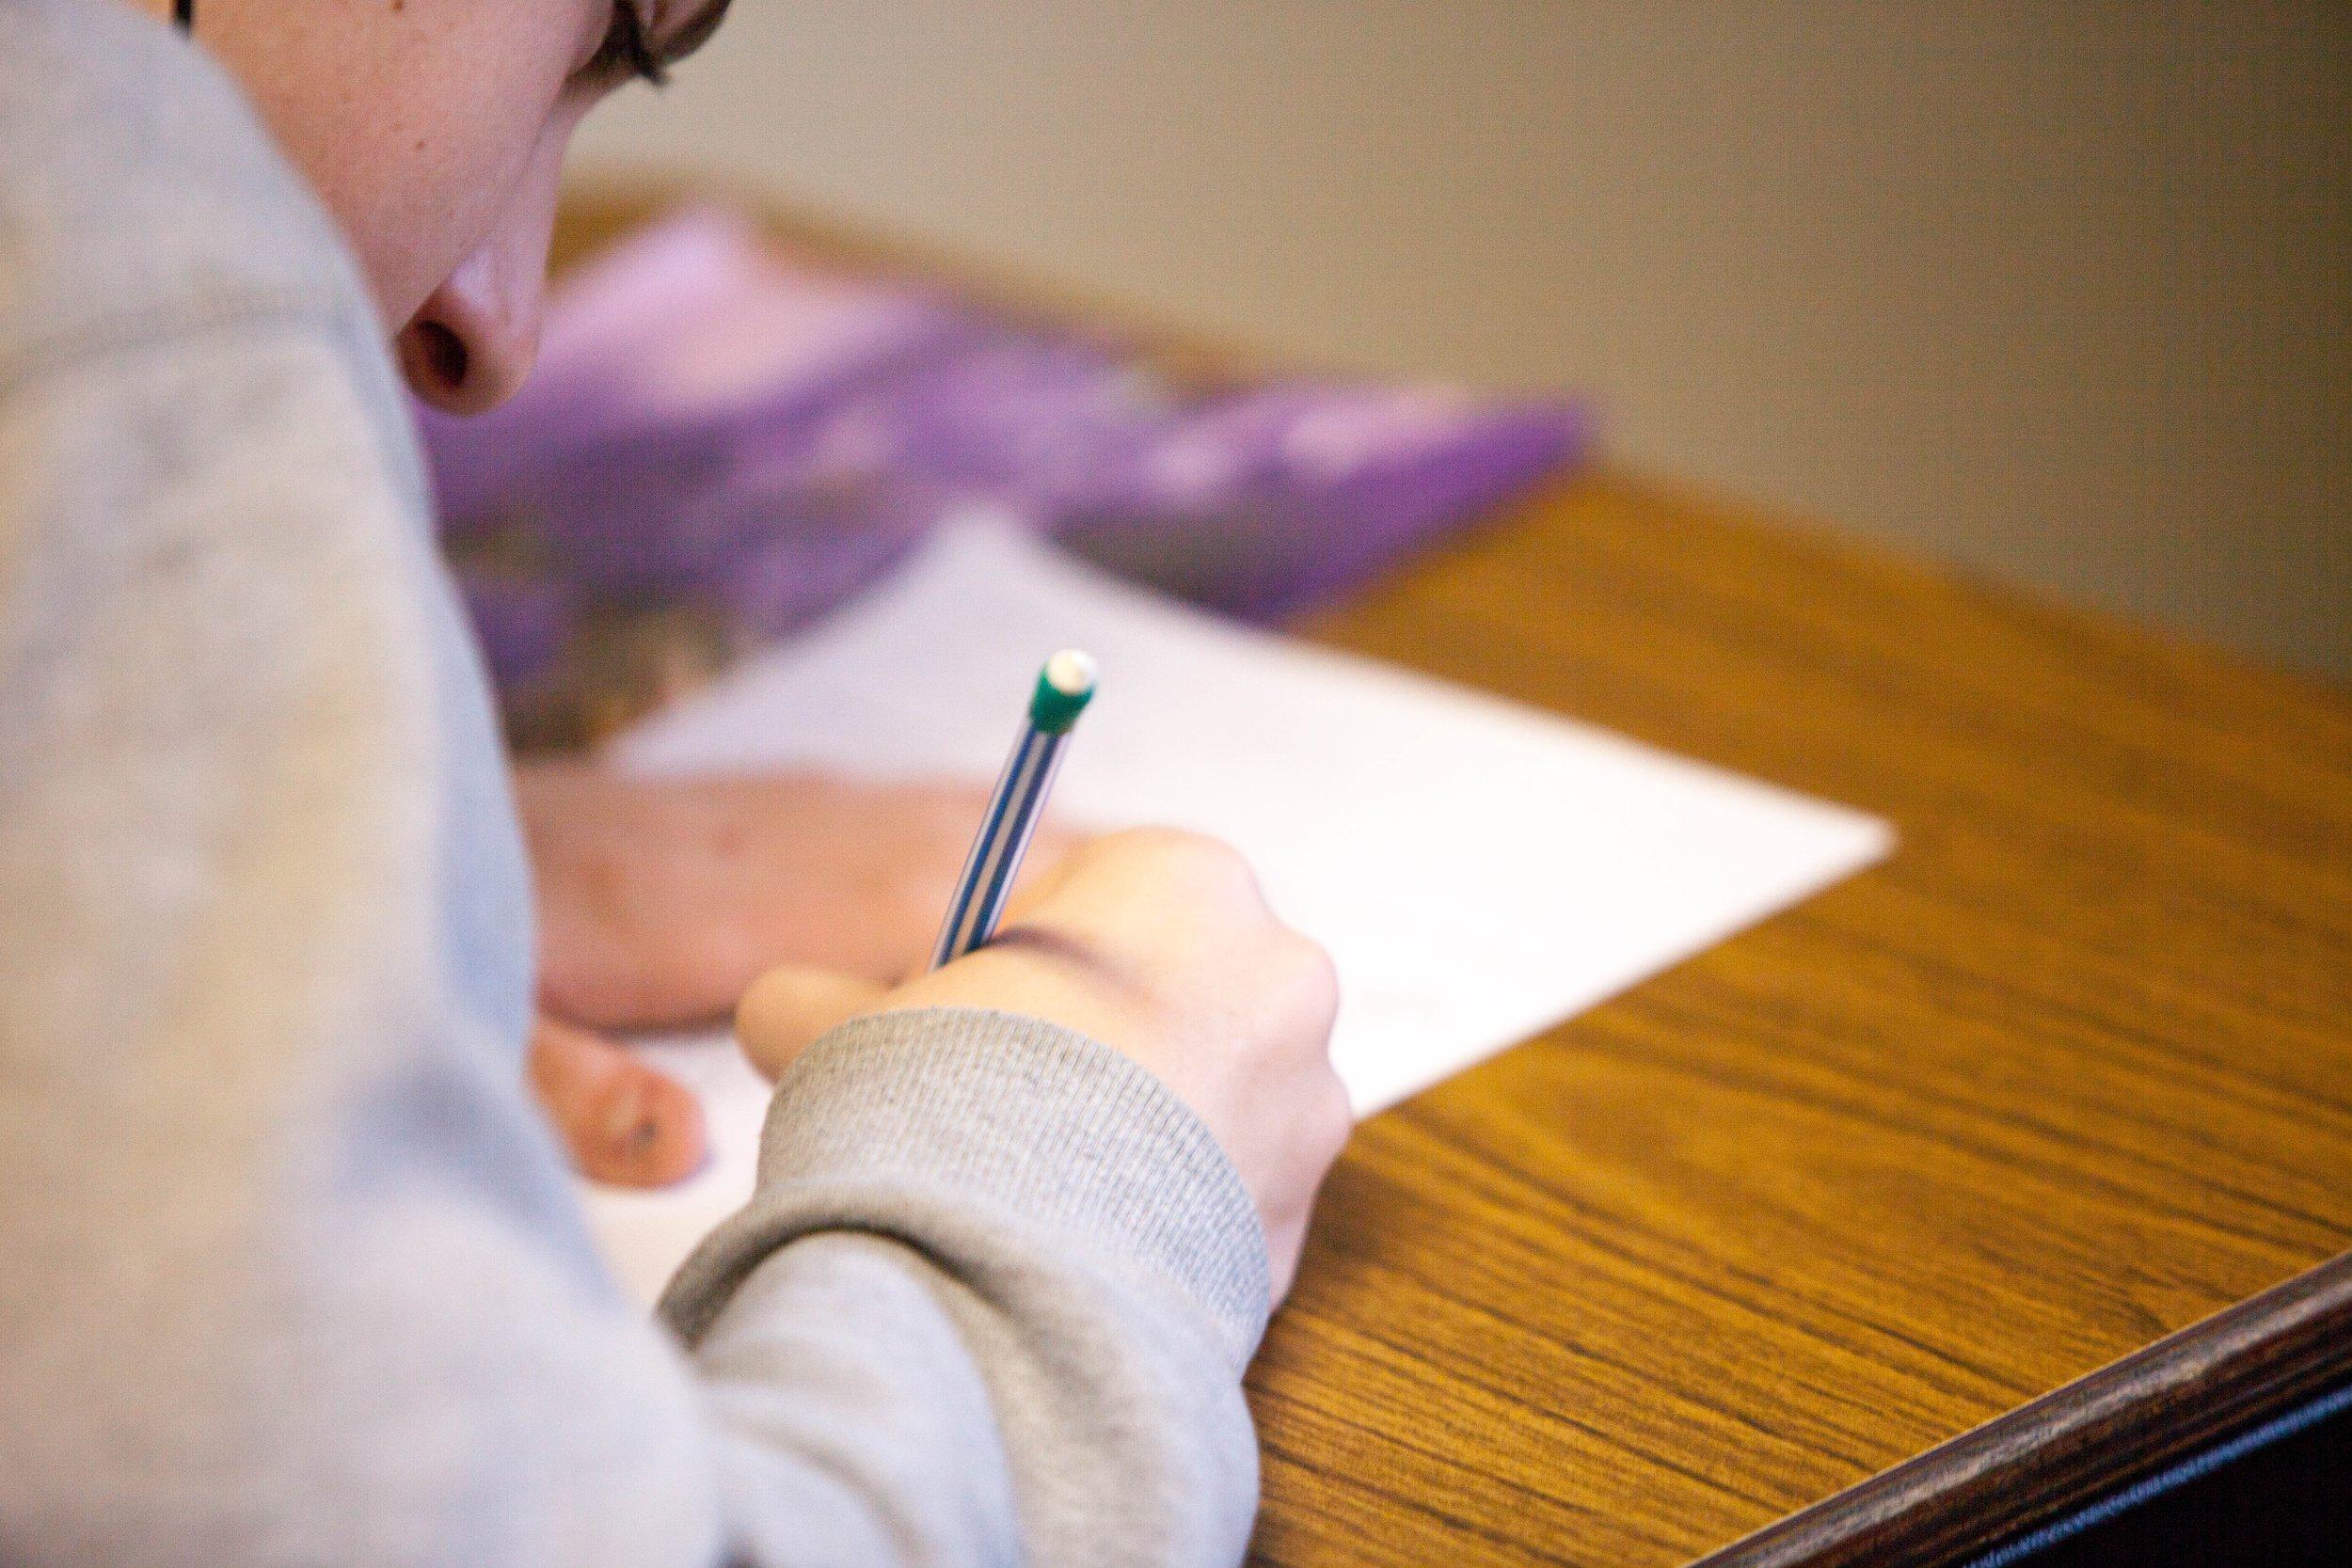 Student Writing - ben-mullins-785450-unsplash.jpg